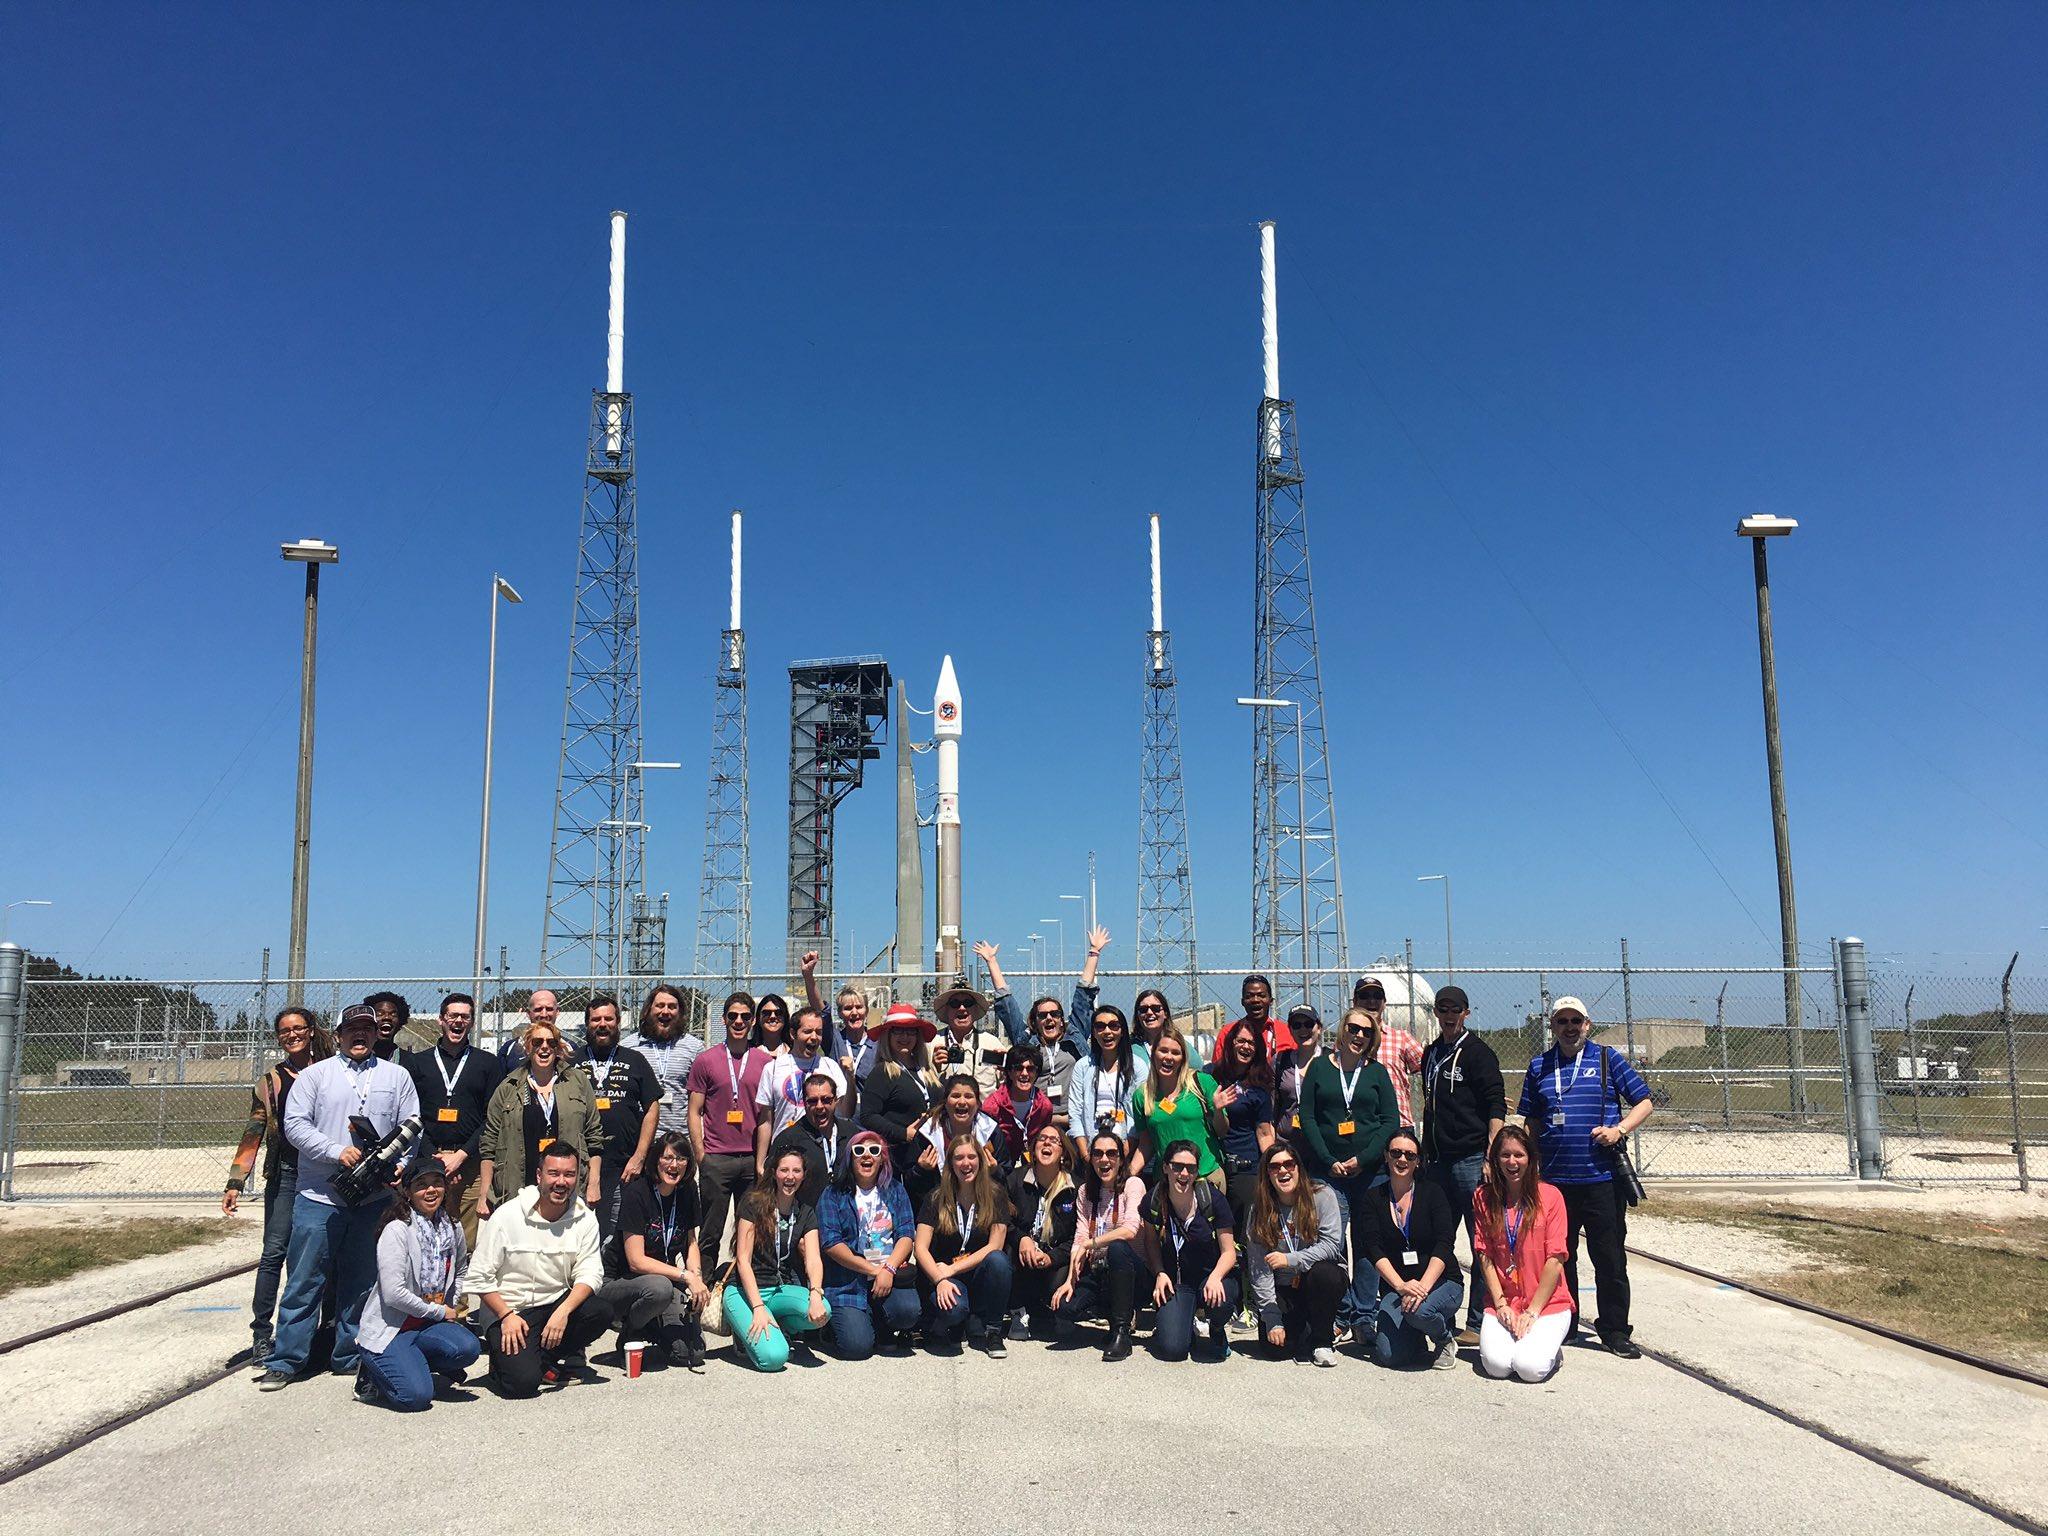 Lancement Atlas V / Cygnus OA-6 - 23 mars 2016 au KSC - Page 3 CeK0CACWAAAoAMC